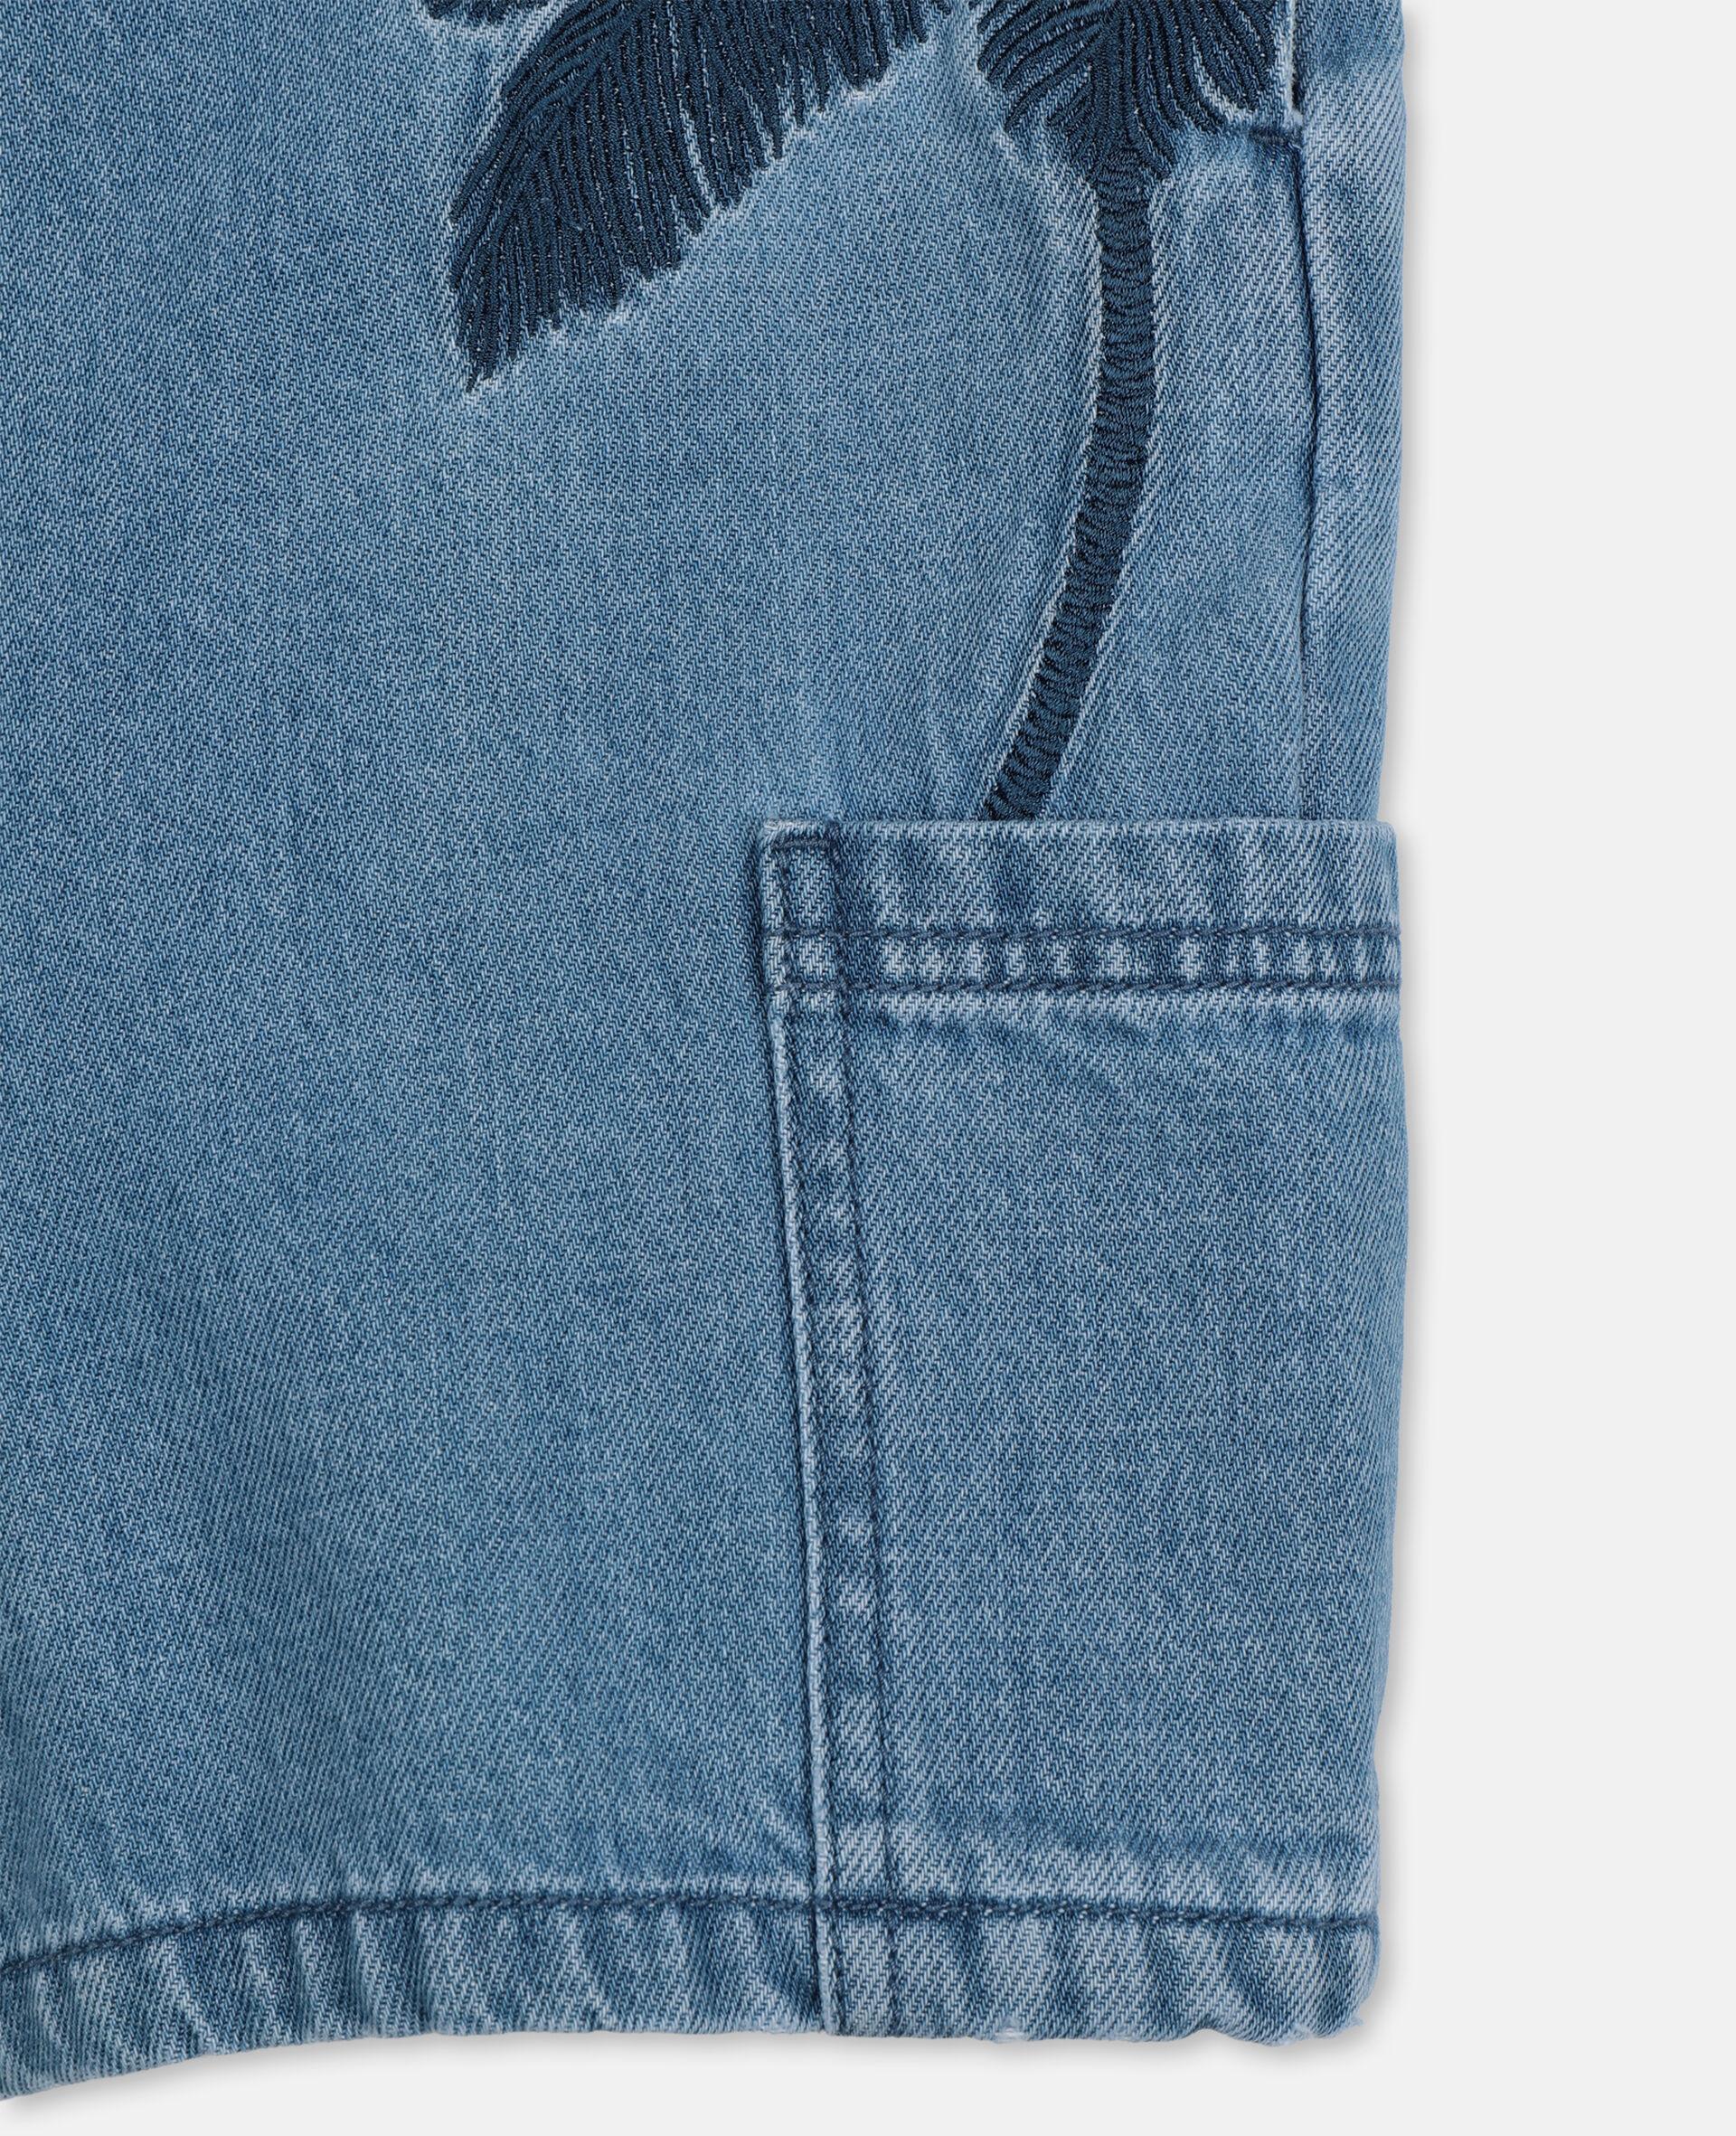 Embroidered Palms Denim Overalls-Blue-large image number 1